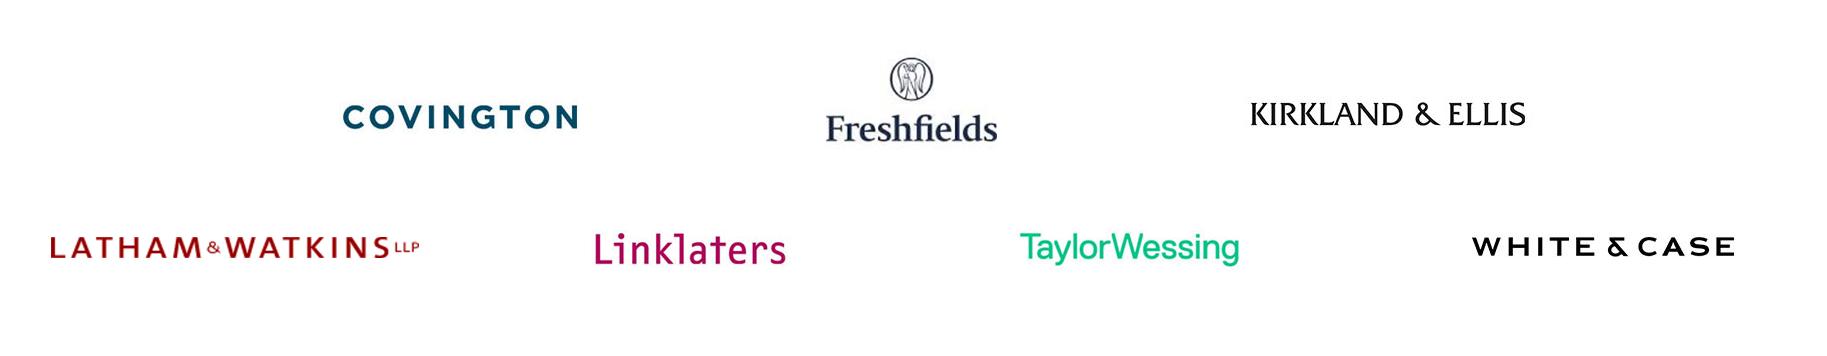 Logos Förderer: Covington, Freshfields, Kirkland & Ellis, Latham & Watkins LLP, Linklaters, Taylor Wessing, White & Case